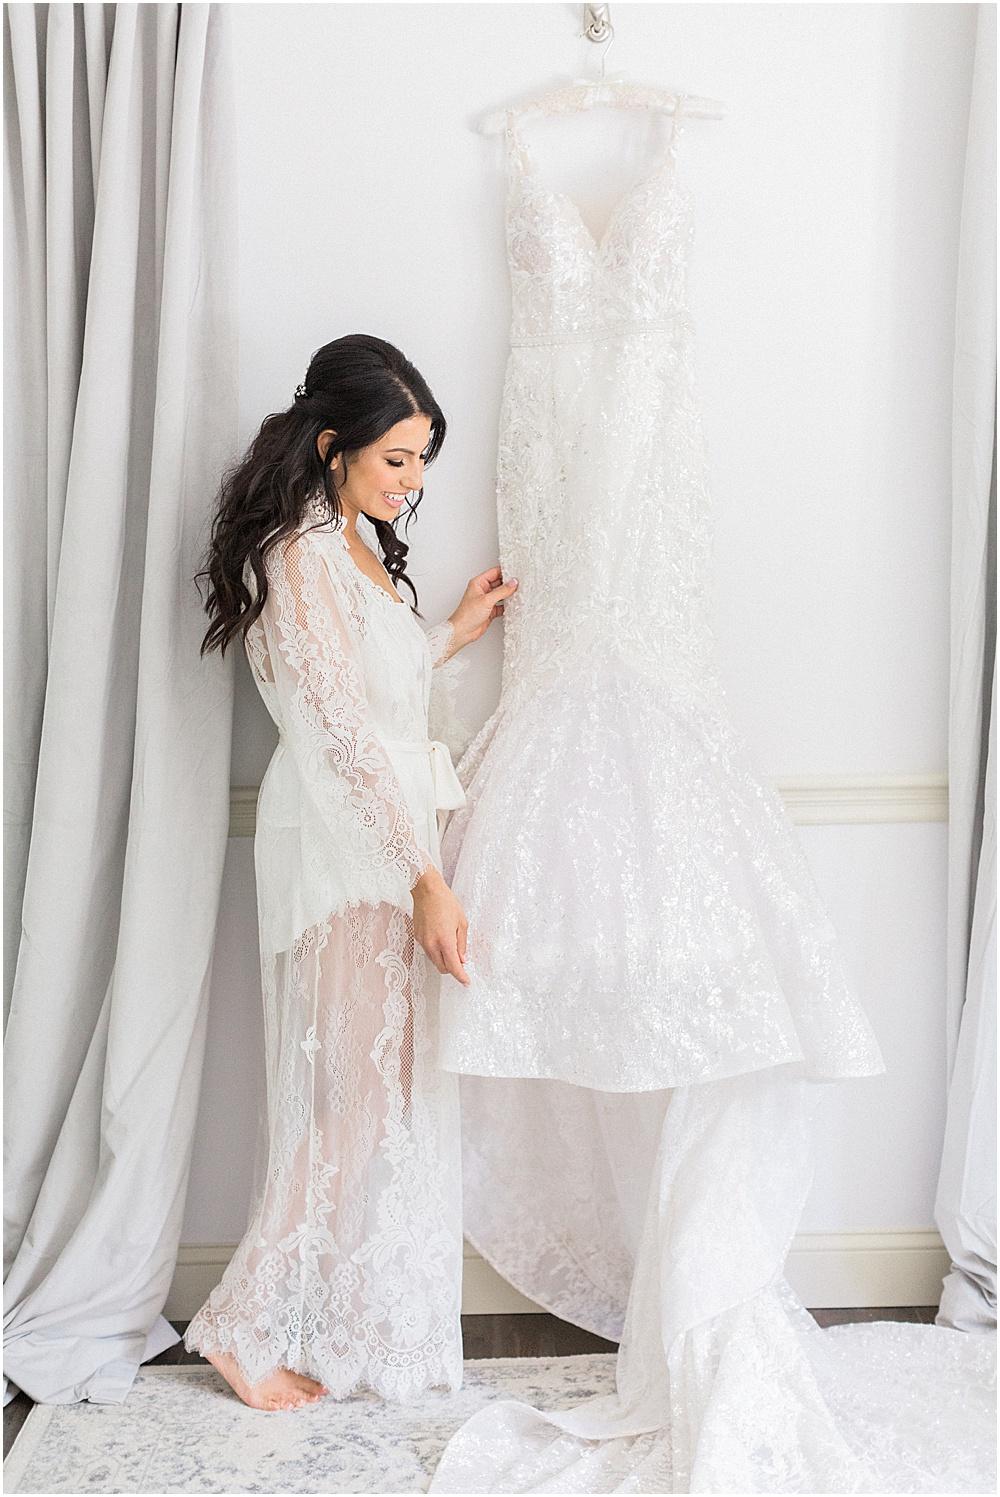 beauport_hotel_gloucester_lebanese_blush_sparkle_design_studio_odette_najib_cedars_hummus_massachusetts_boston_wedding_photographer_meredith_jane_photography_photo_0491.jpg